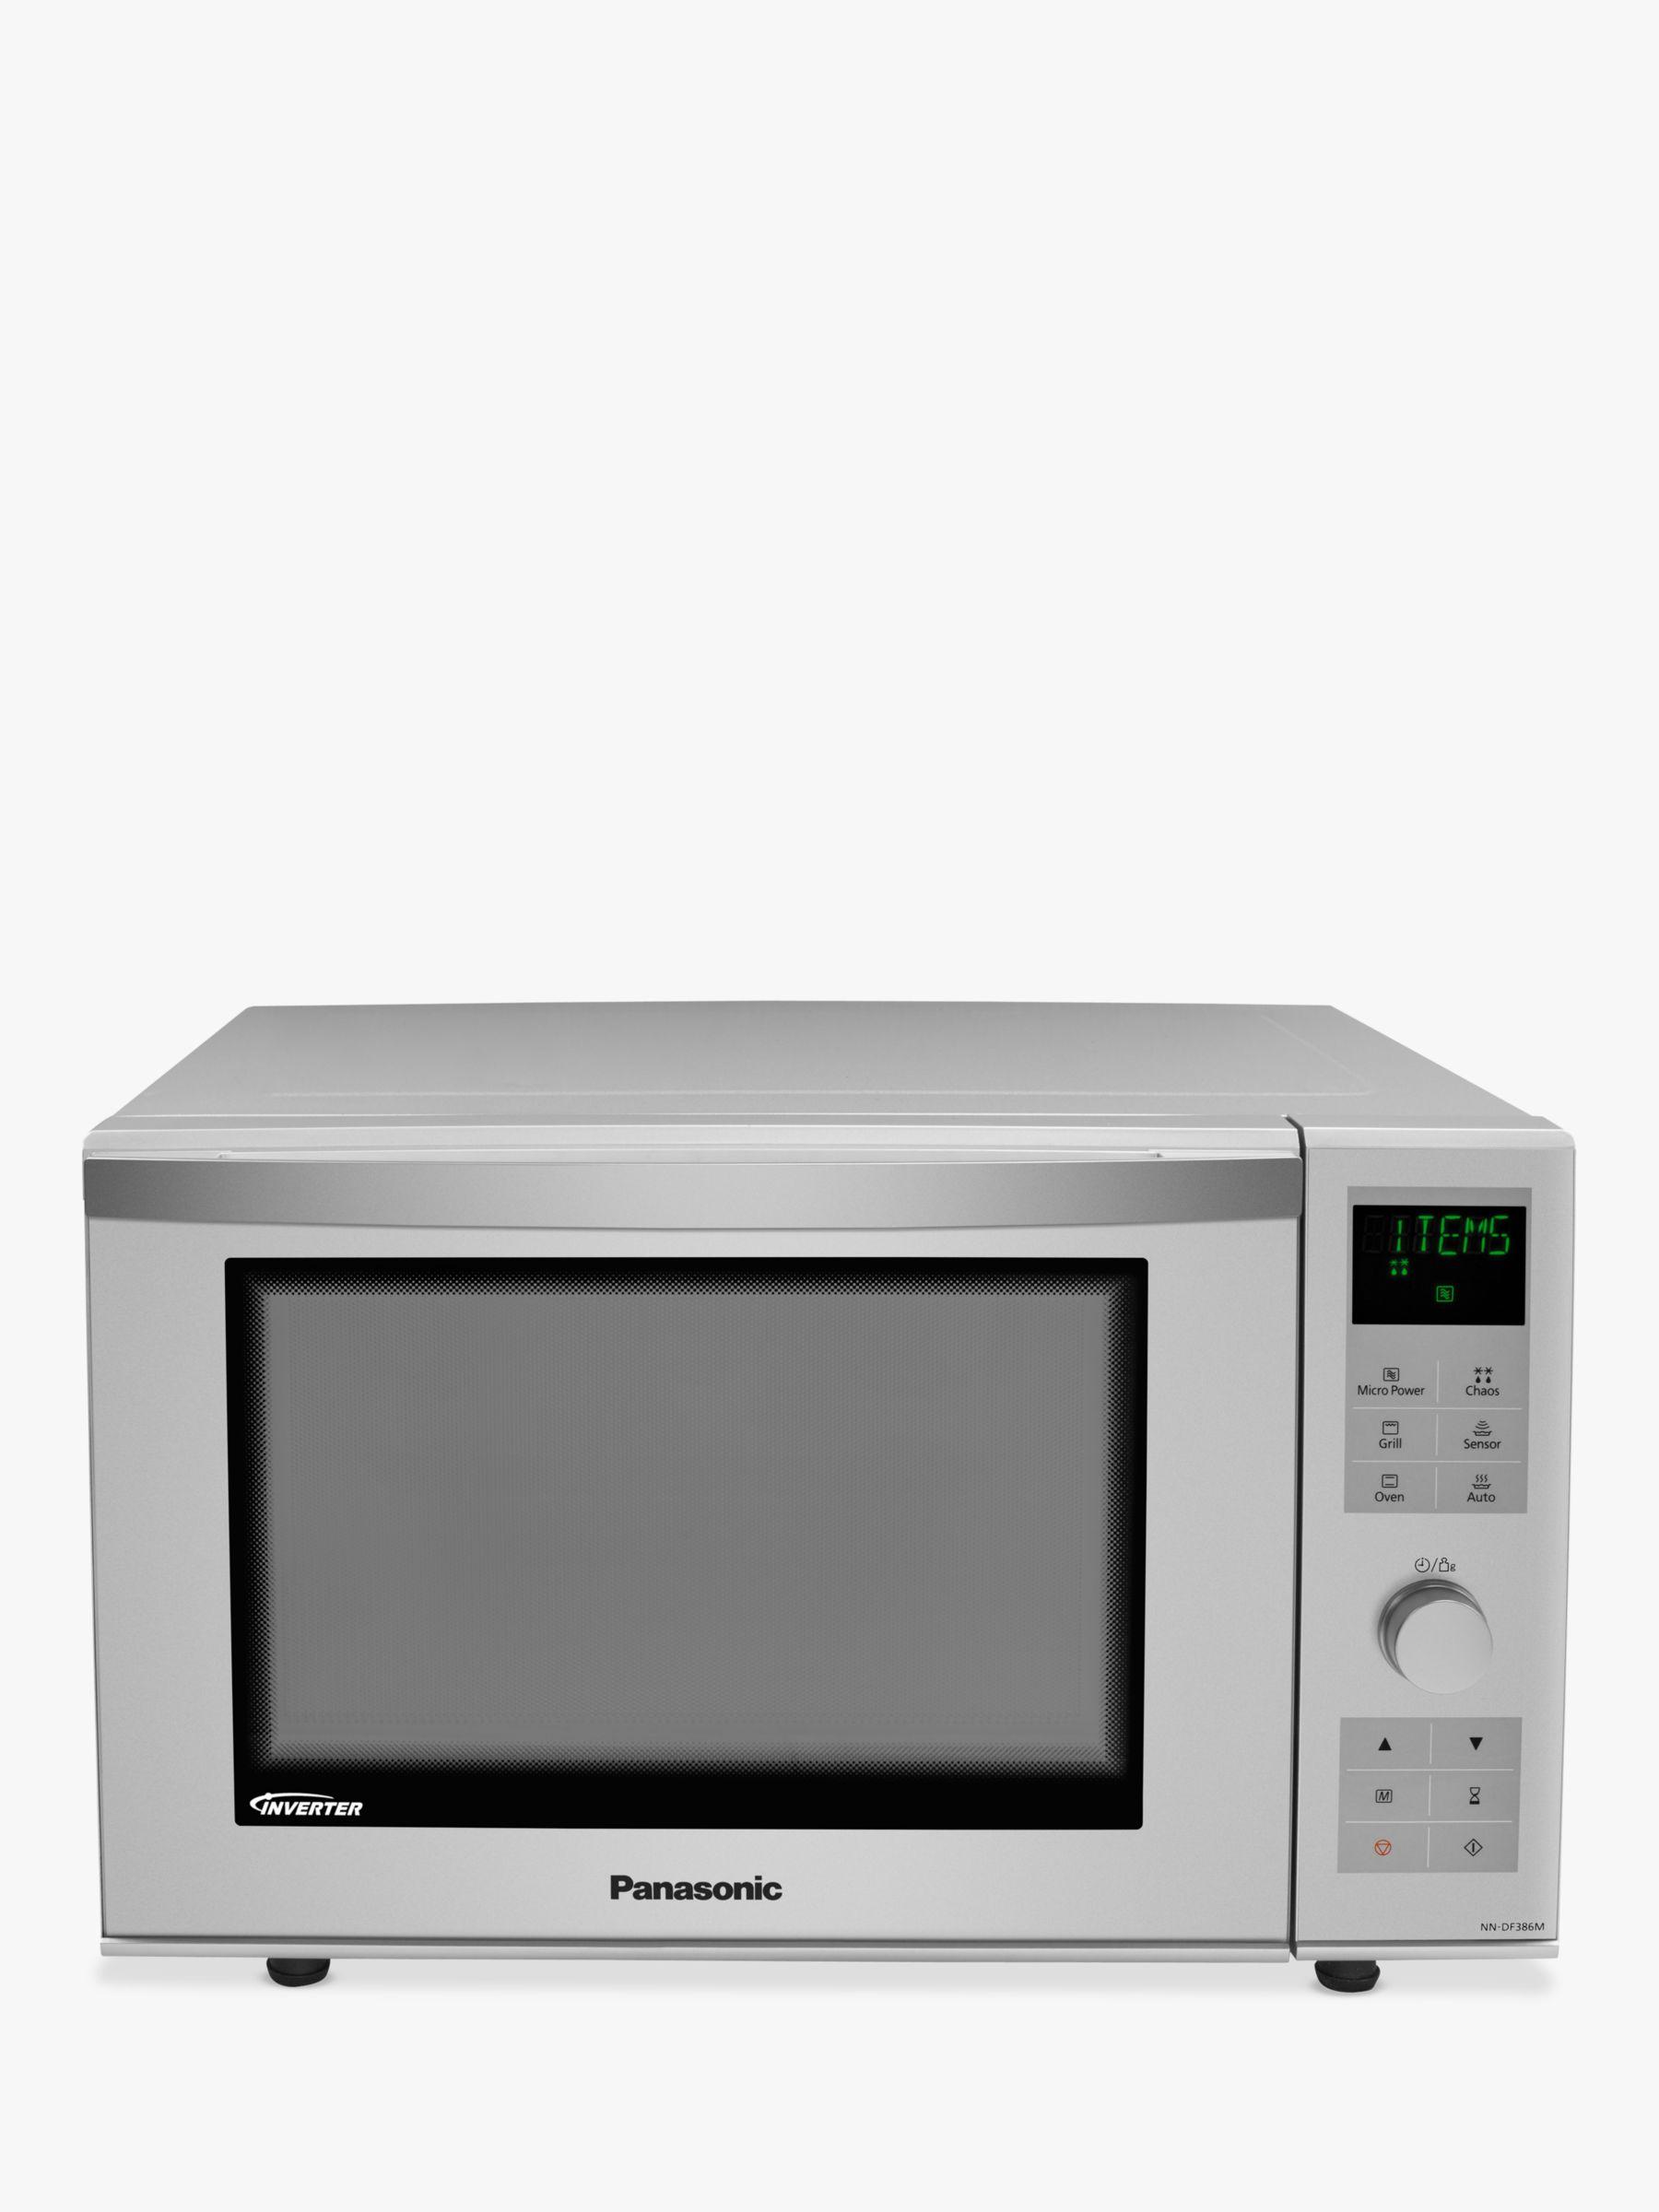 Panasonic Panasonic NN-DF386MBPQ Combination Microwave Oven, Silver